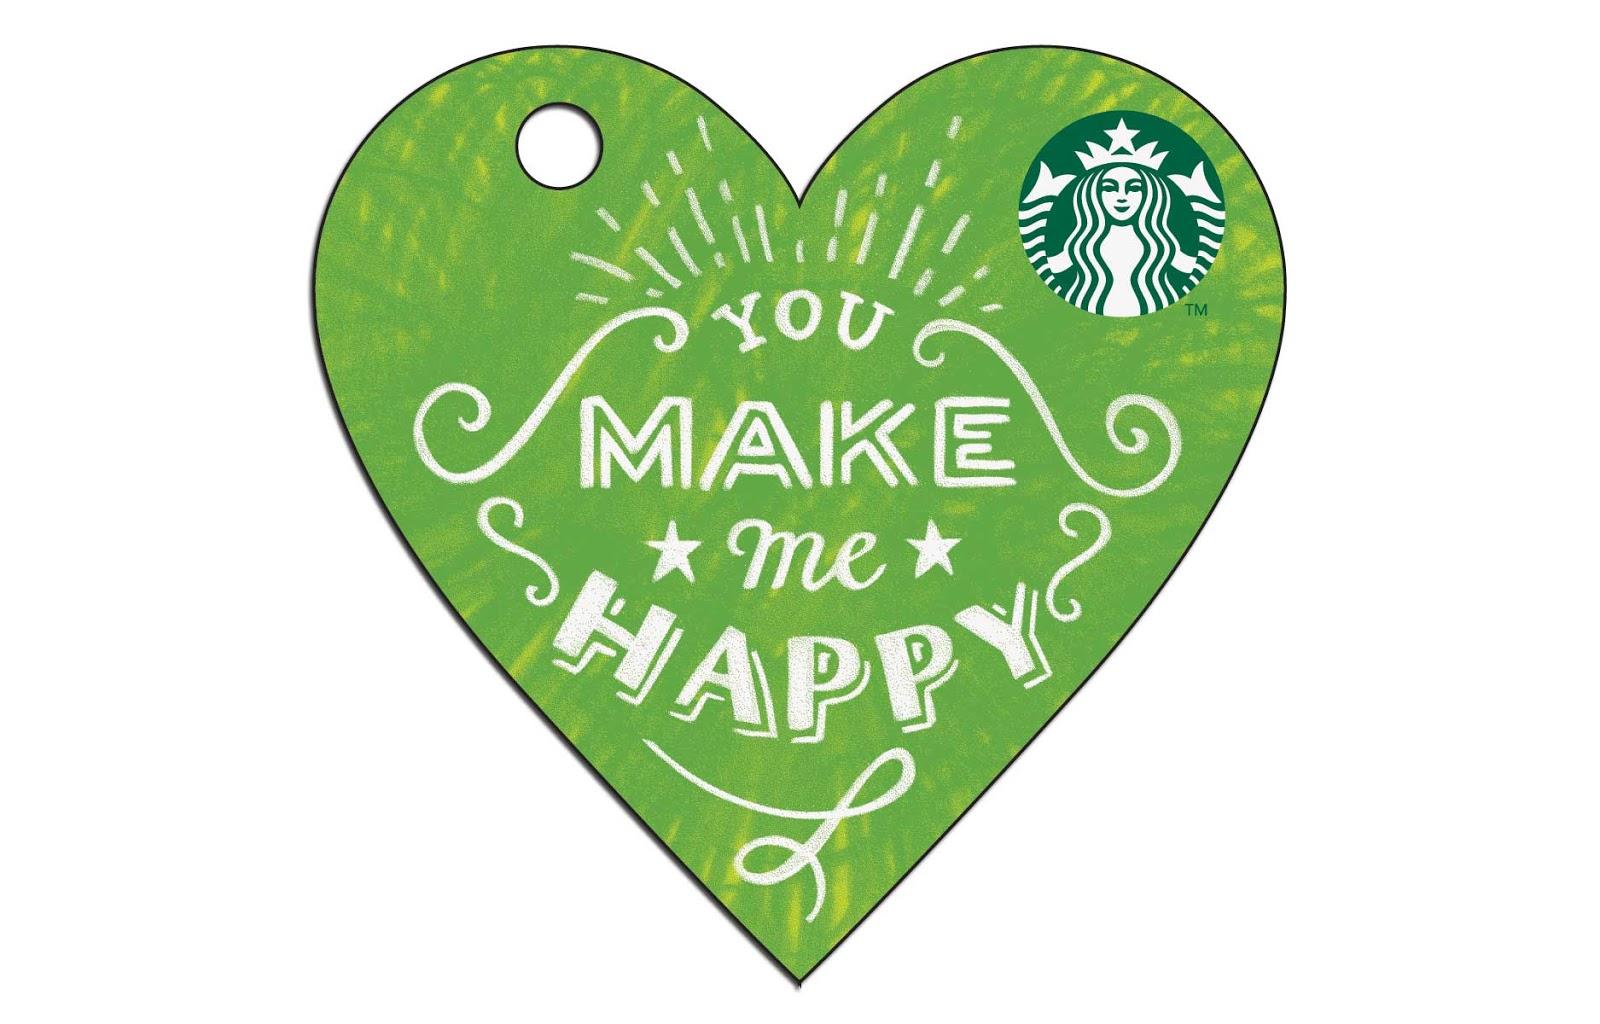 Starbucks Card 2017